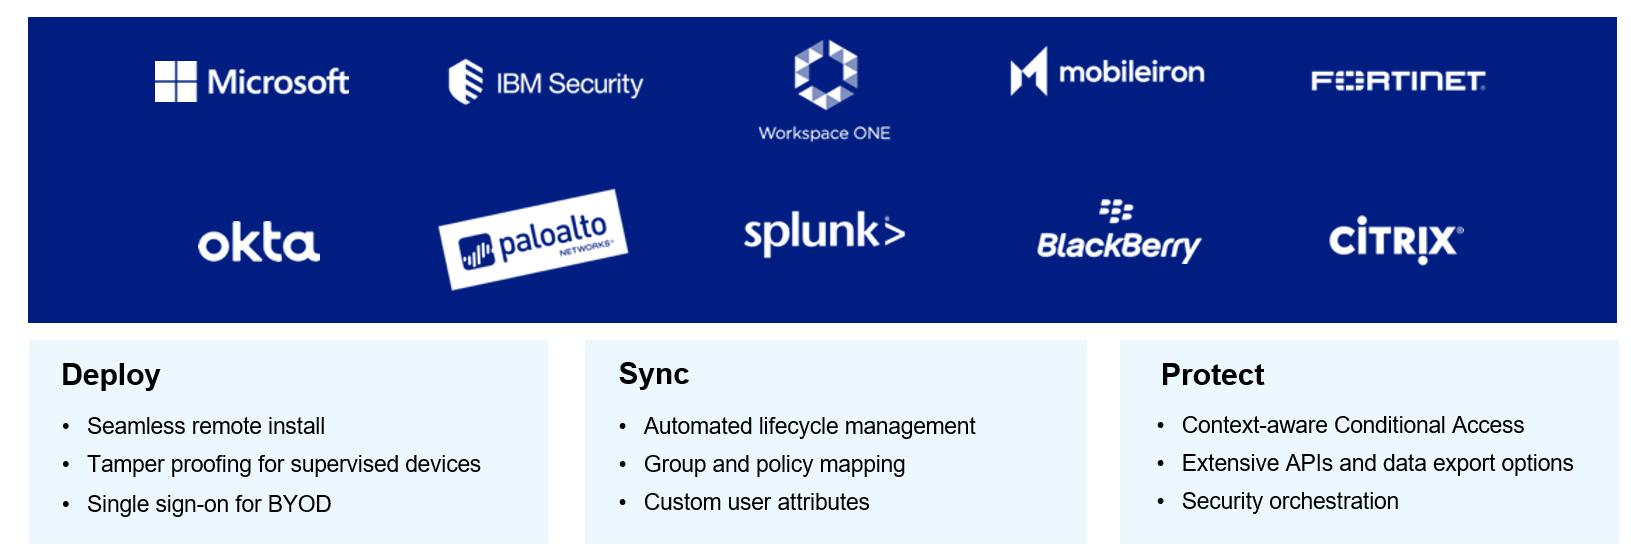 Telstra Enterprise Mobile Protect - integration